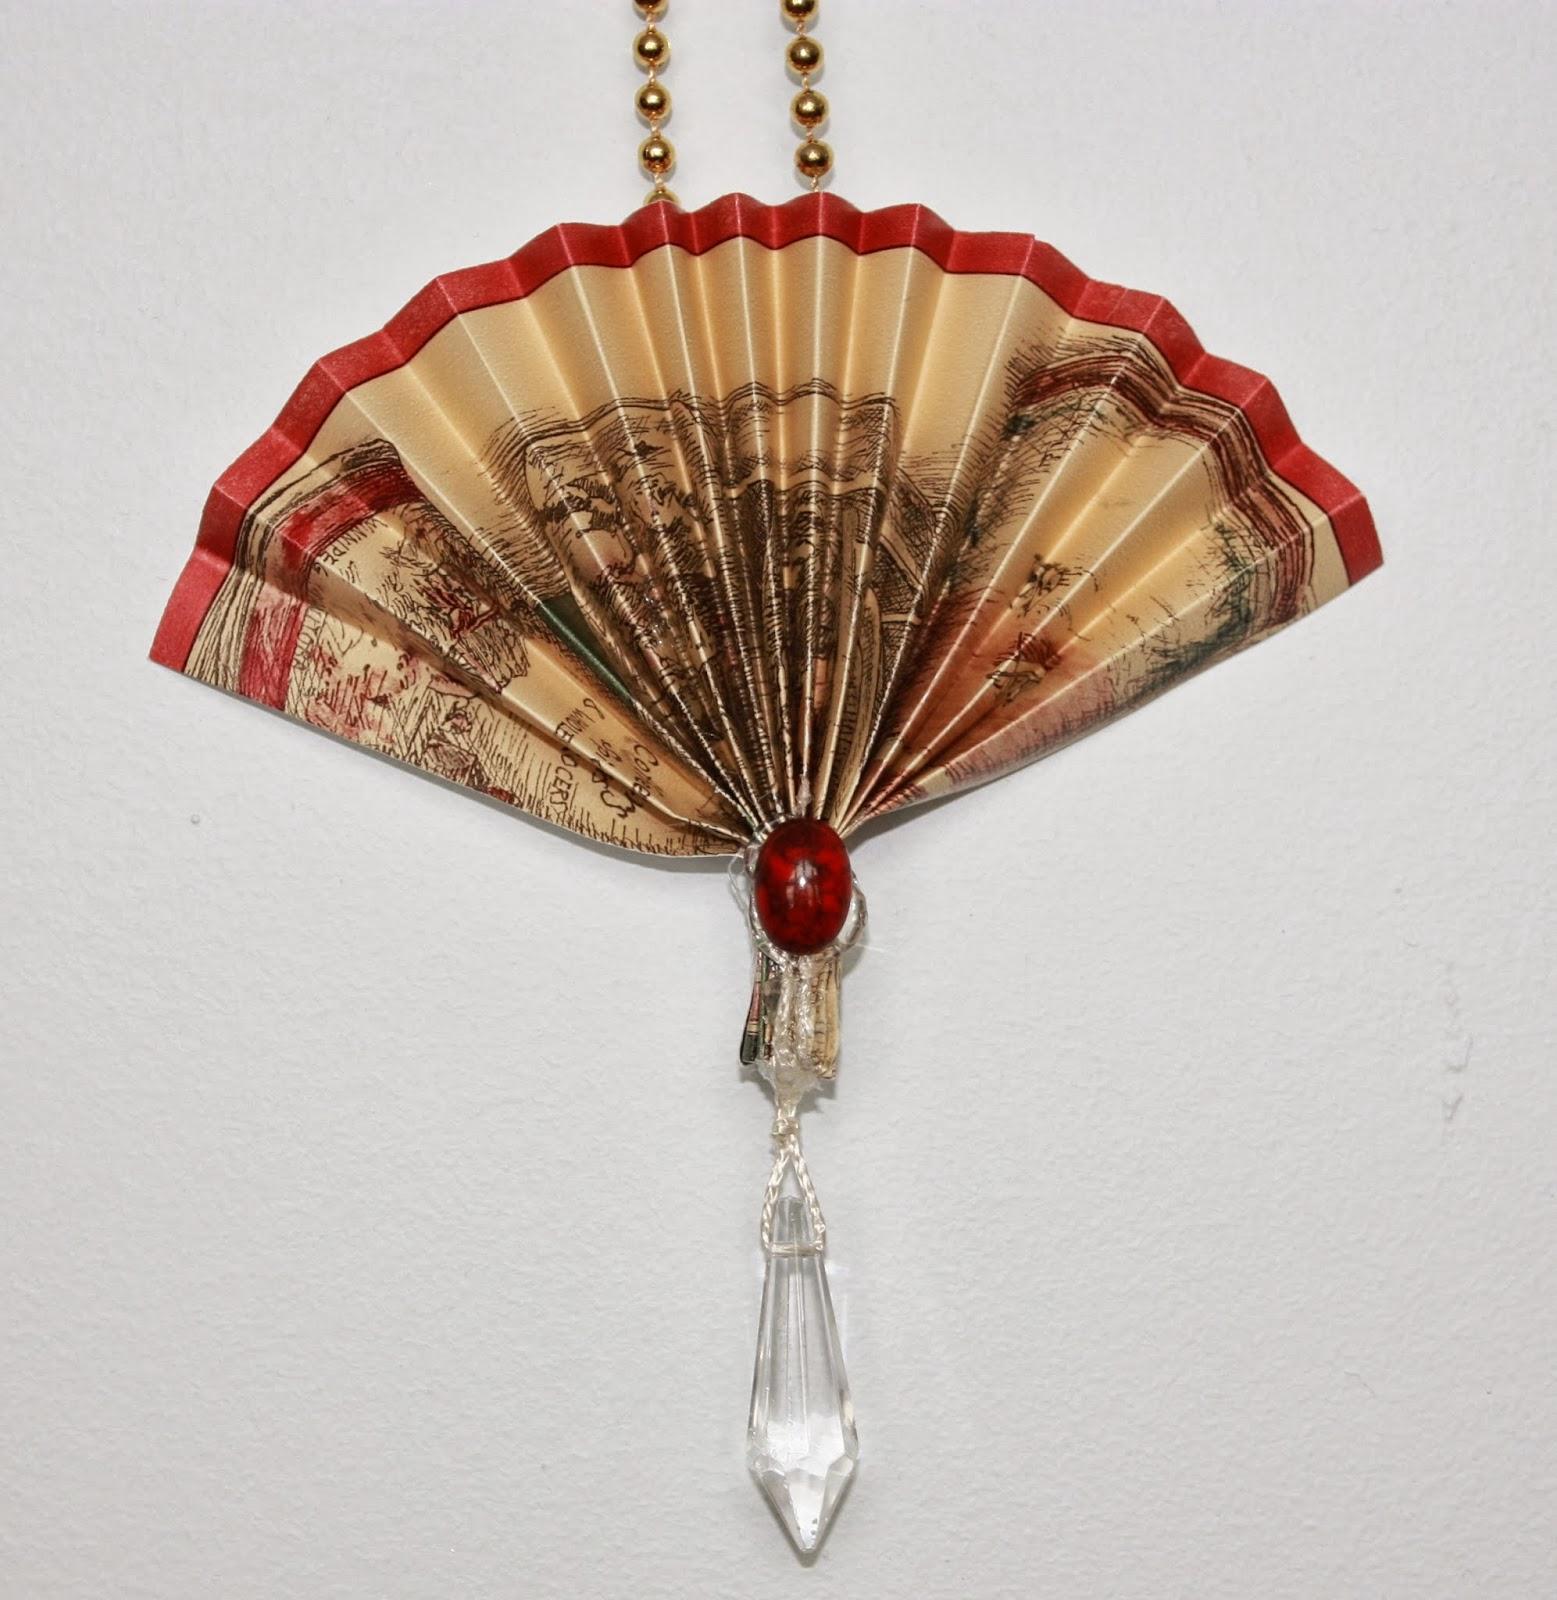 Artsybuildinglady victorian fan christmas ornaments